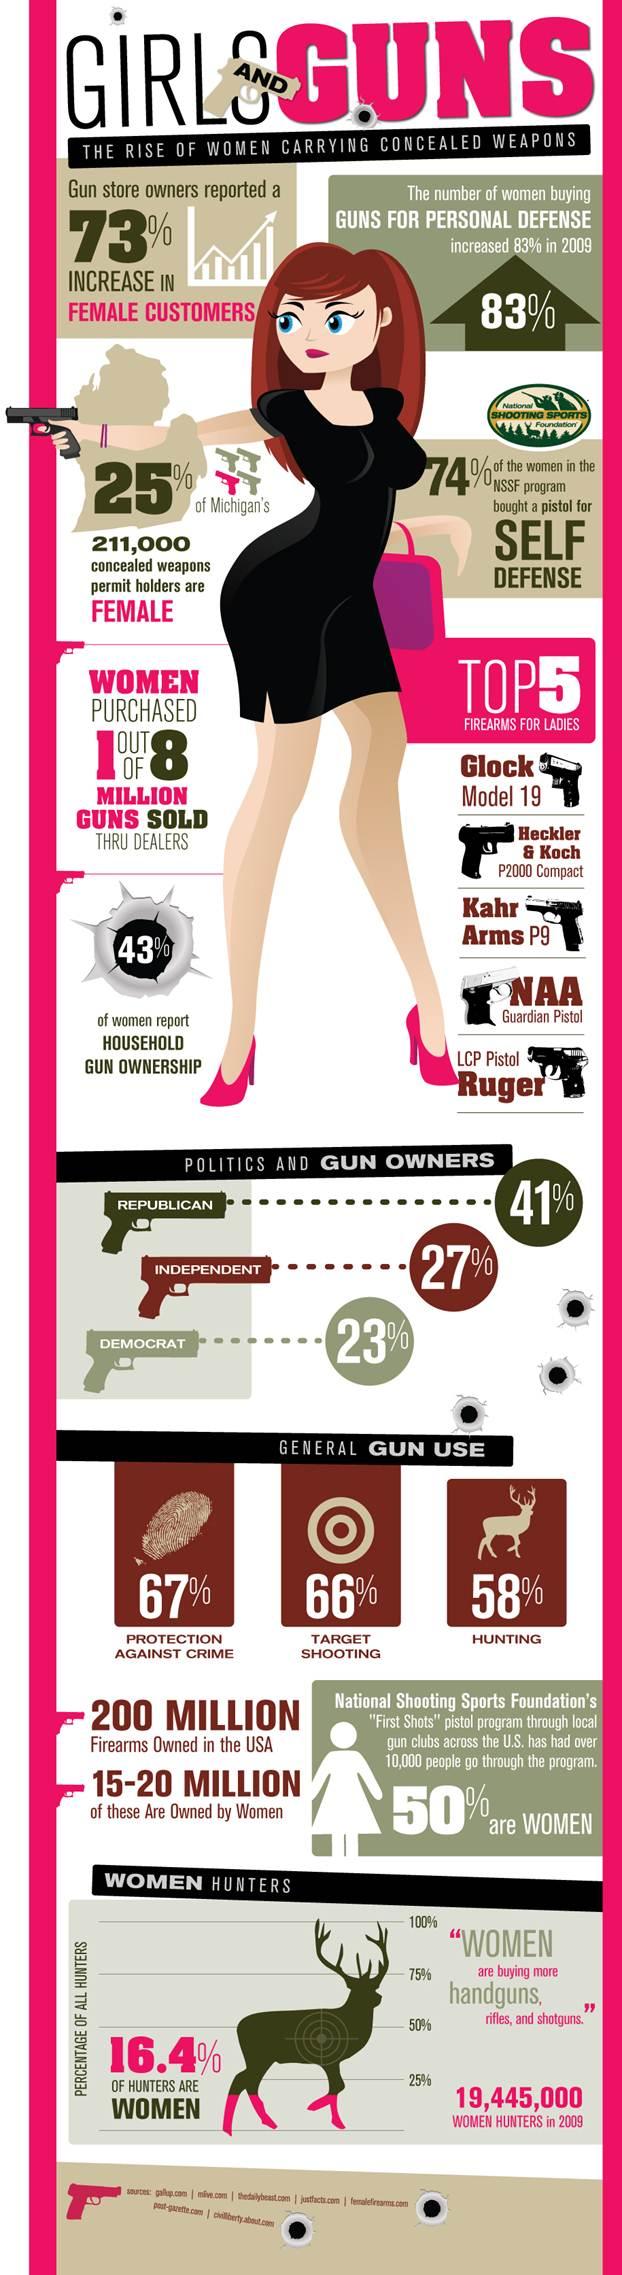 rise of women